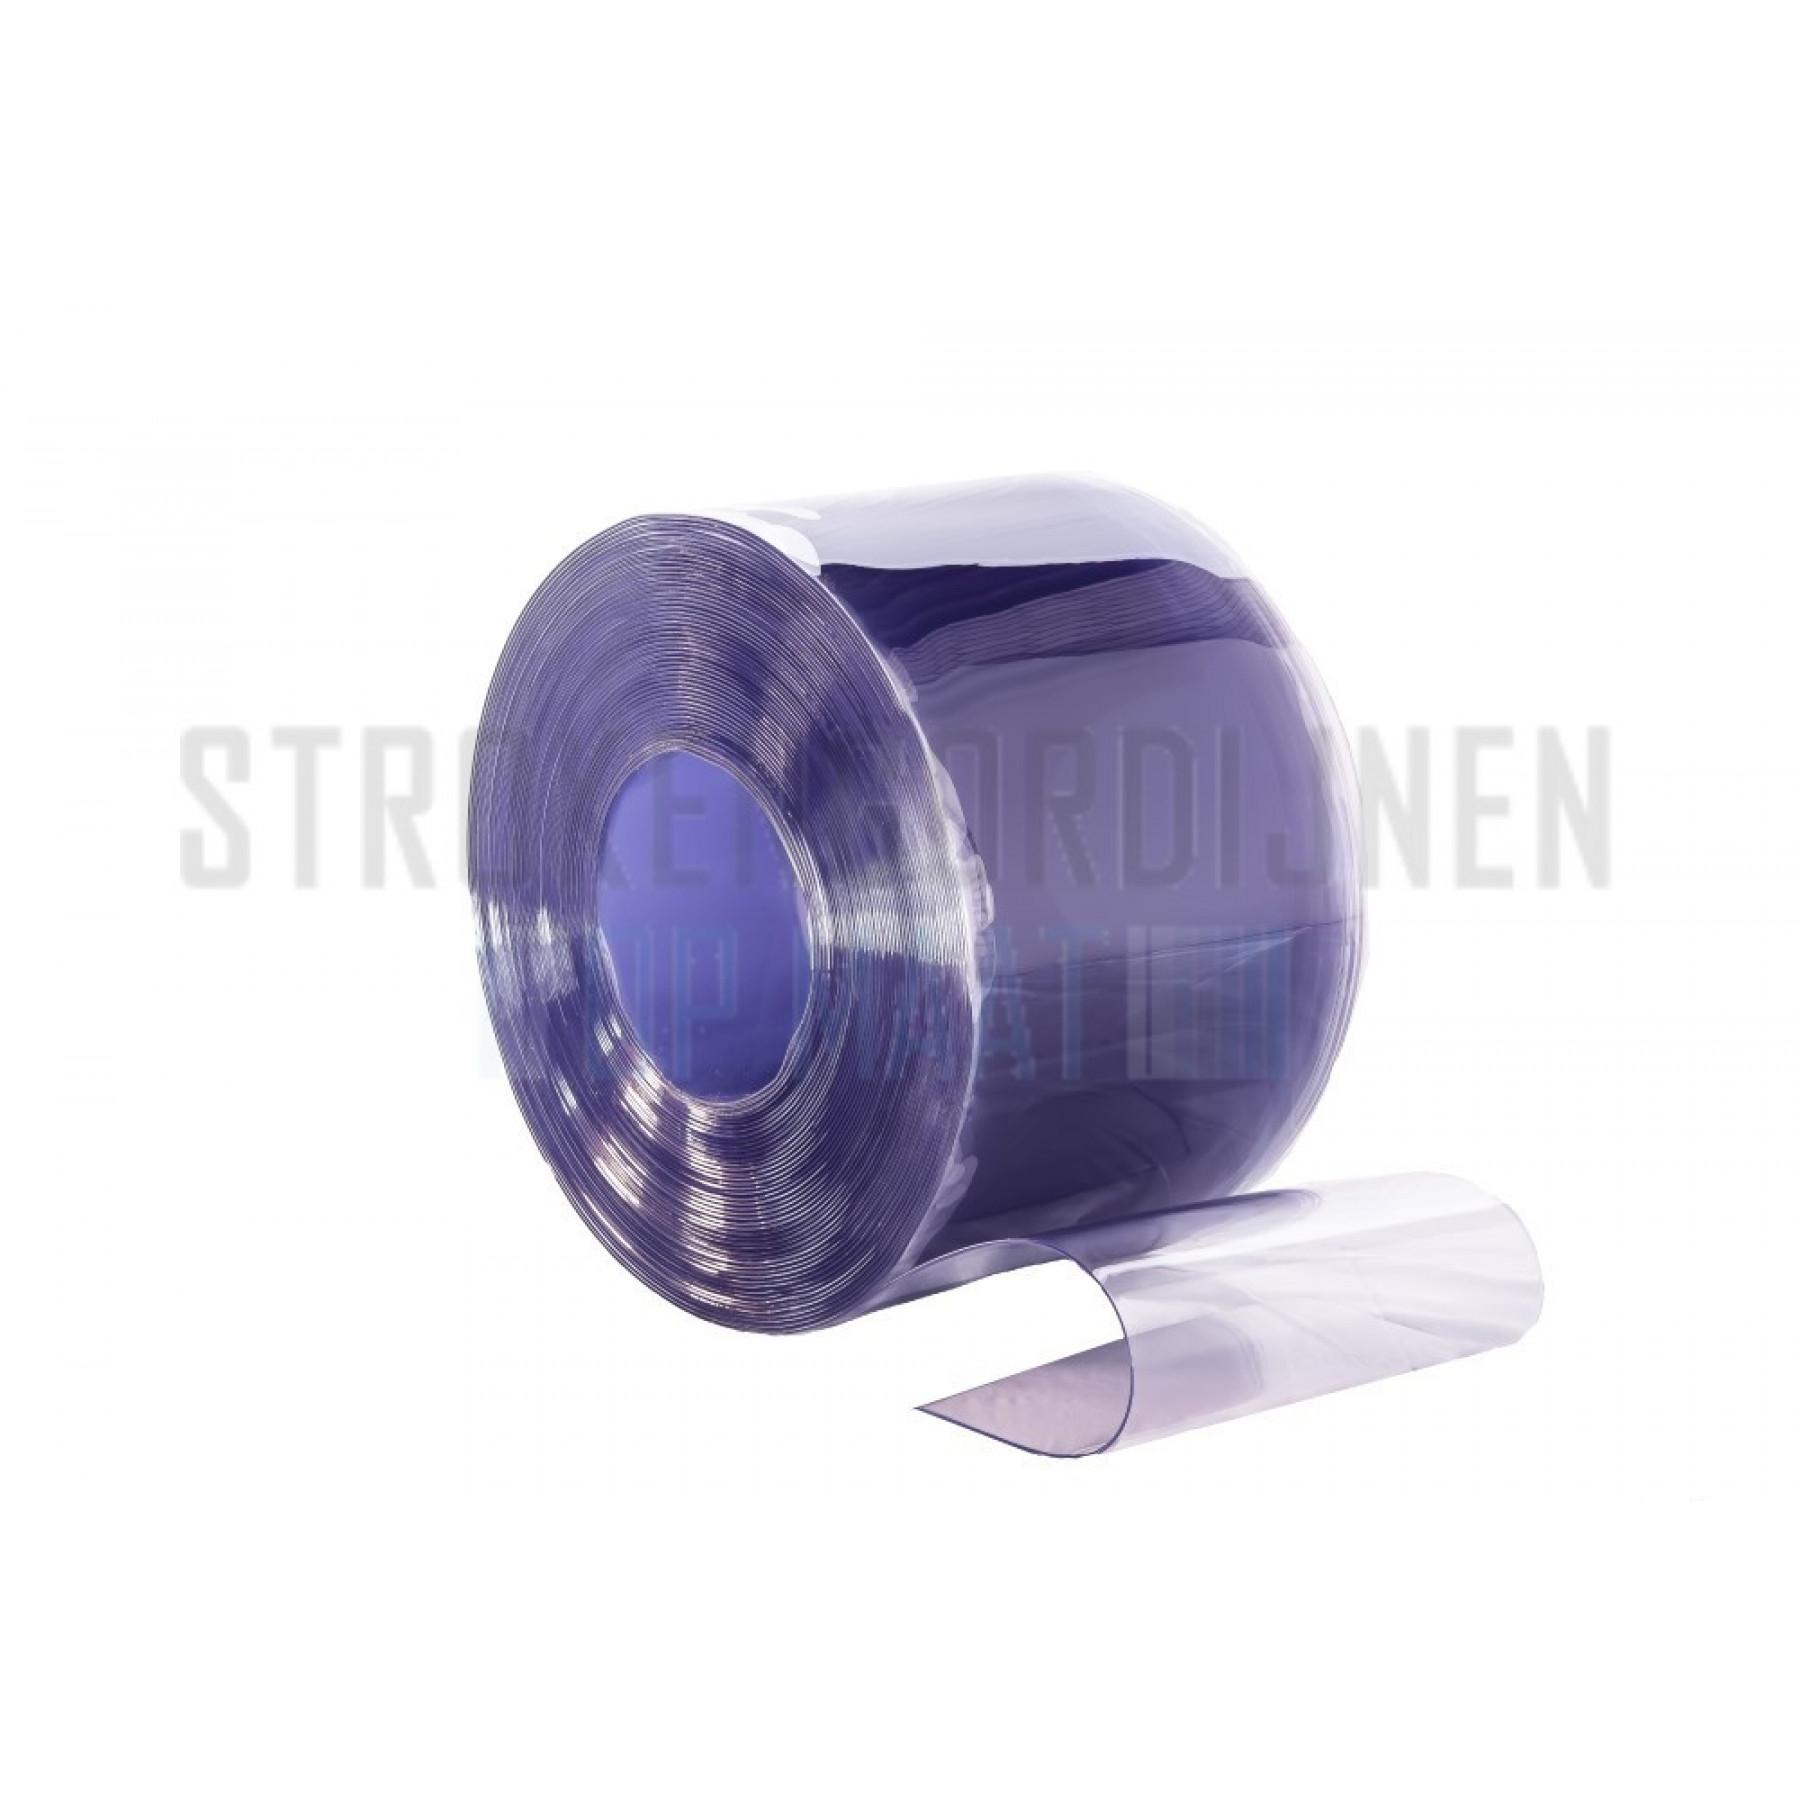 PVC Rolle, 300mm breit, 3mm dick, 25 Meter lang, transparent